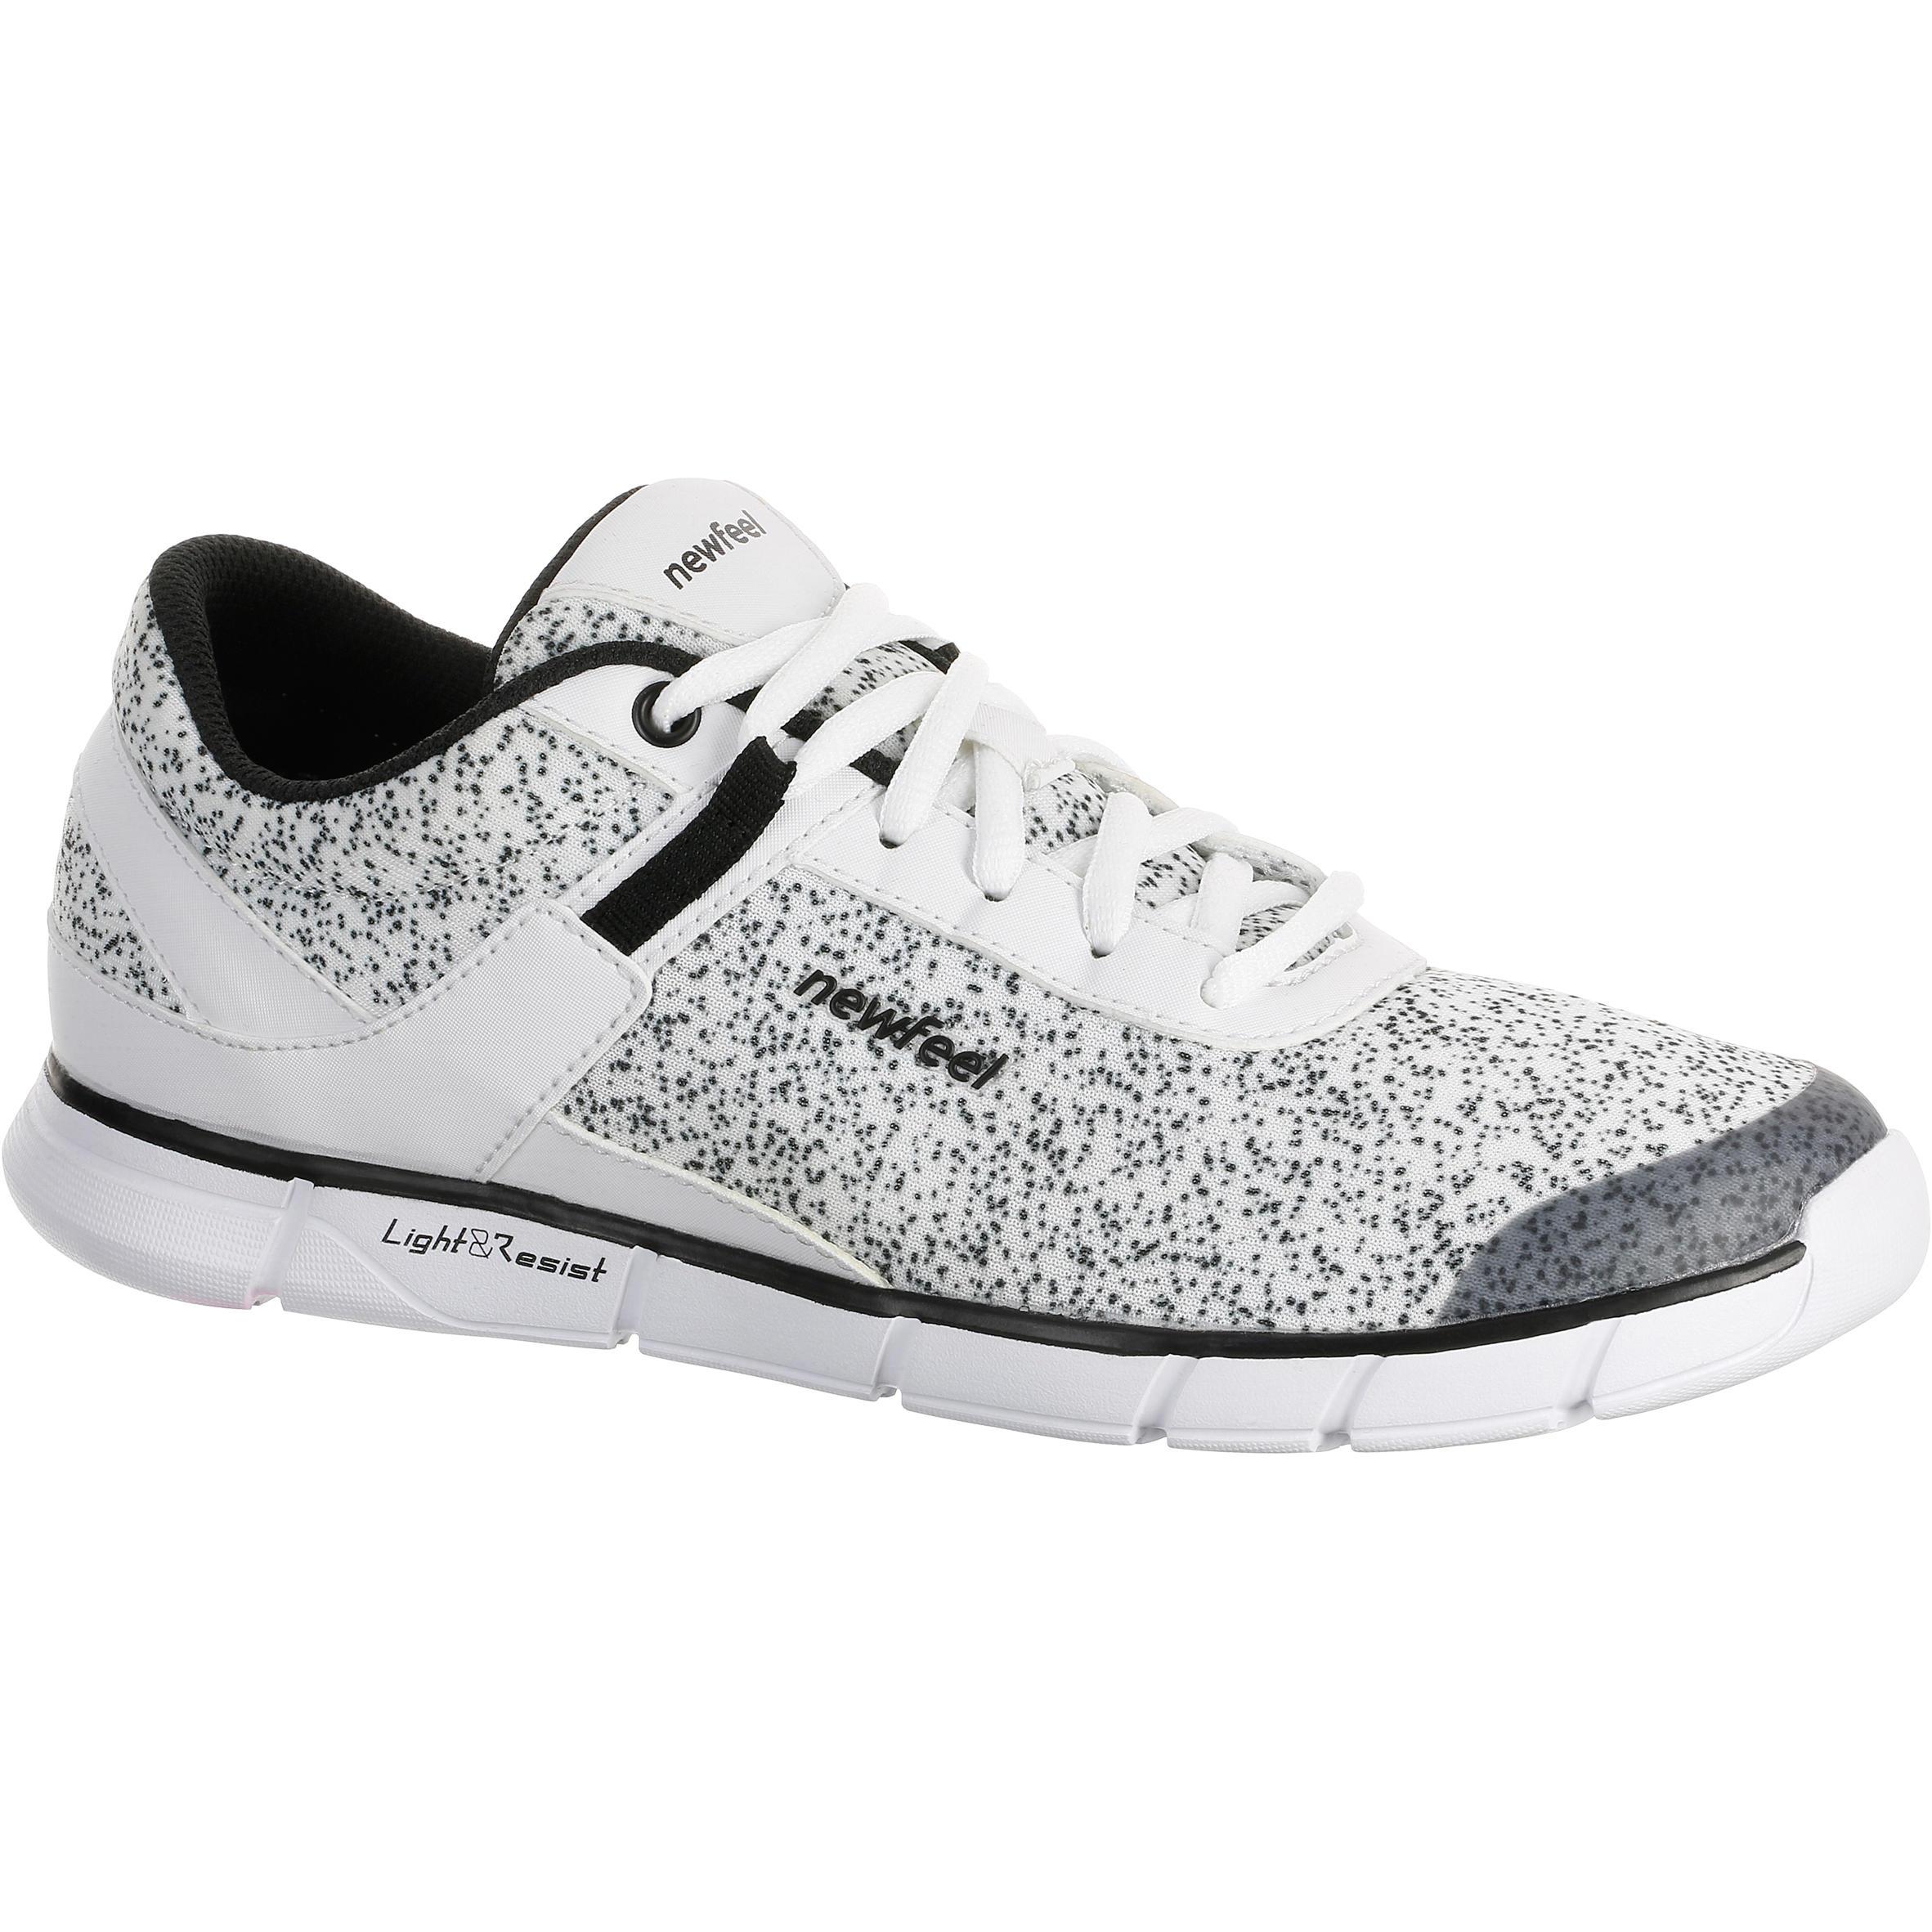 NEWFEEL Chaussures marche sportive femme Soft 540 blanc moucheté - NEWFEEL - 37